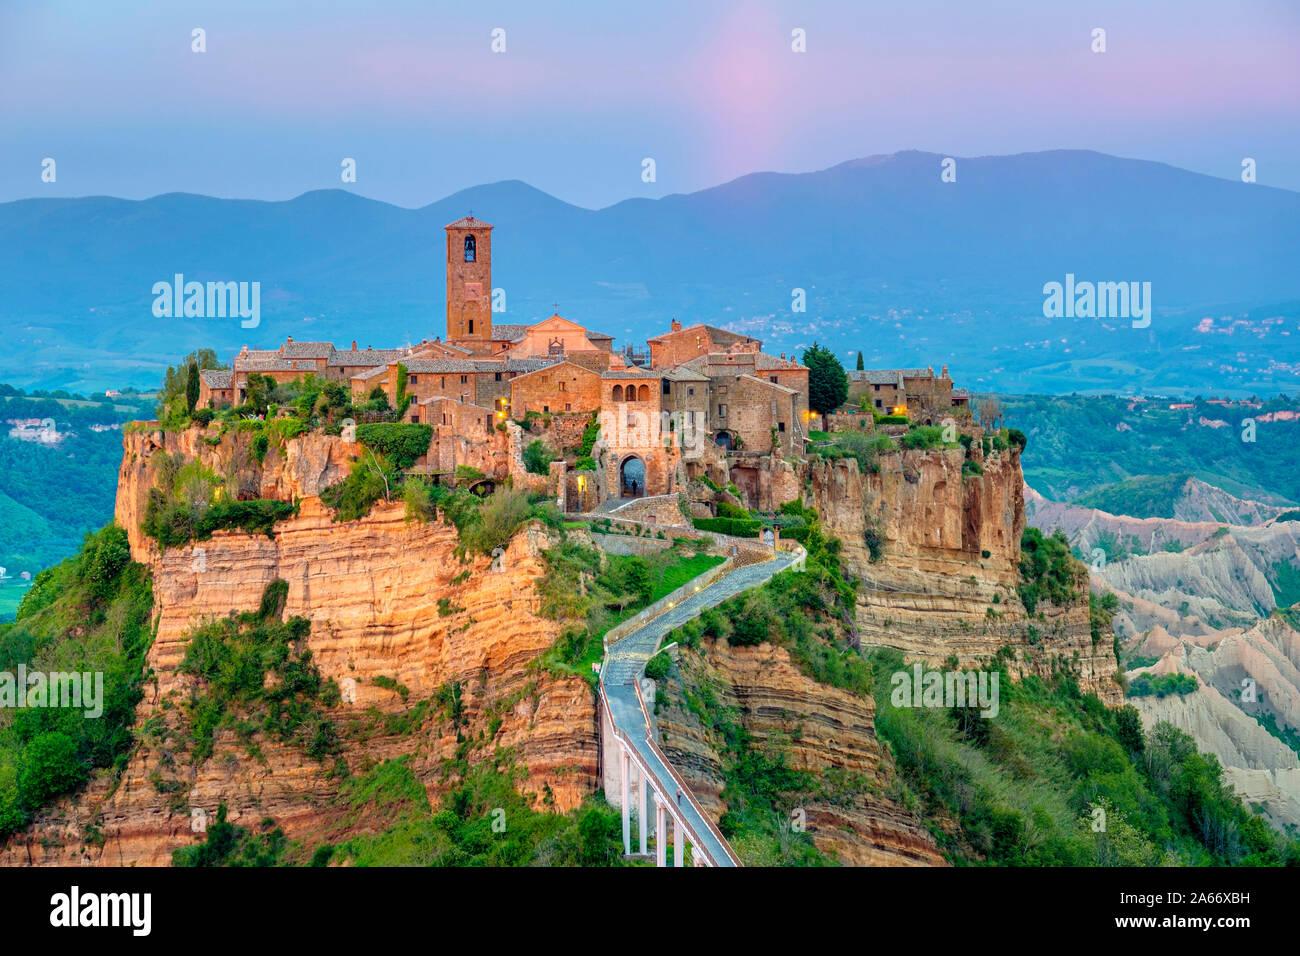 Civita di Bagnoregio bei Sonnenuntergang, Bagnoregio, Latium, Italien, Europa. Stockfoto